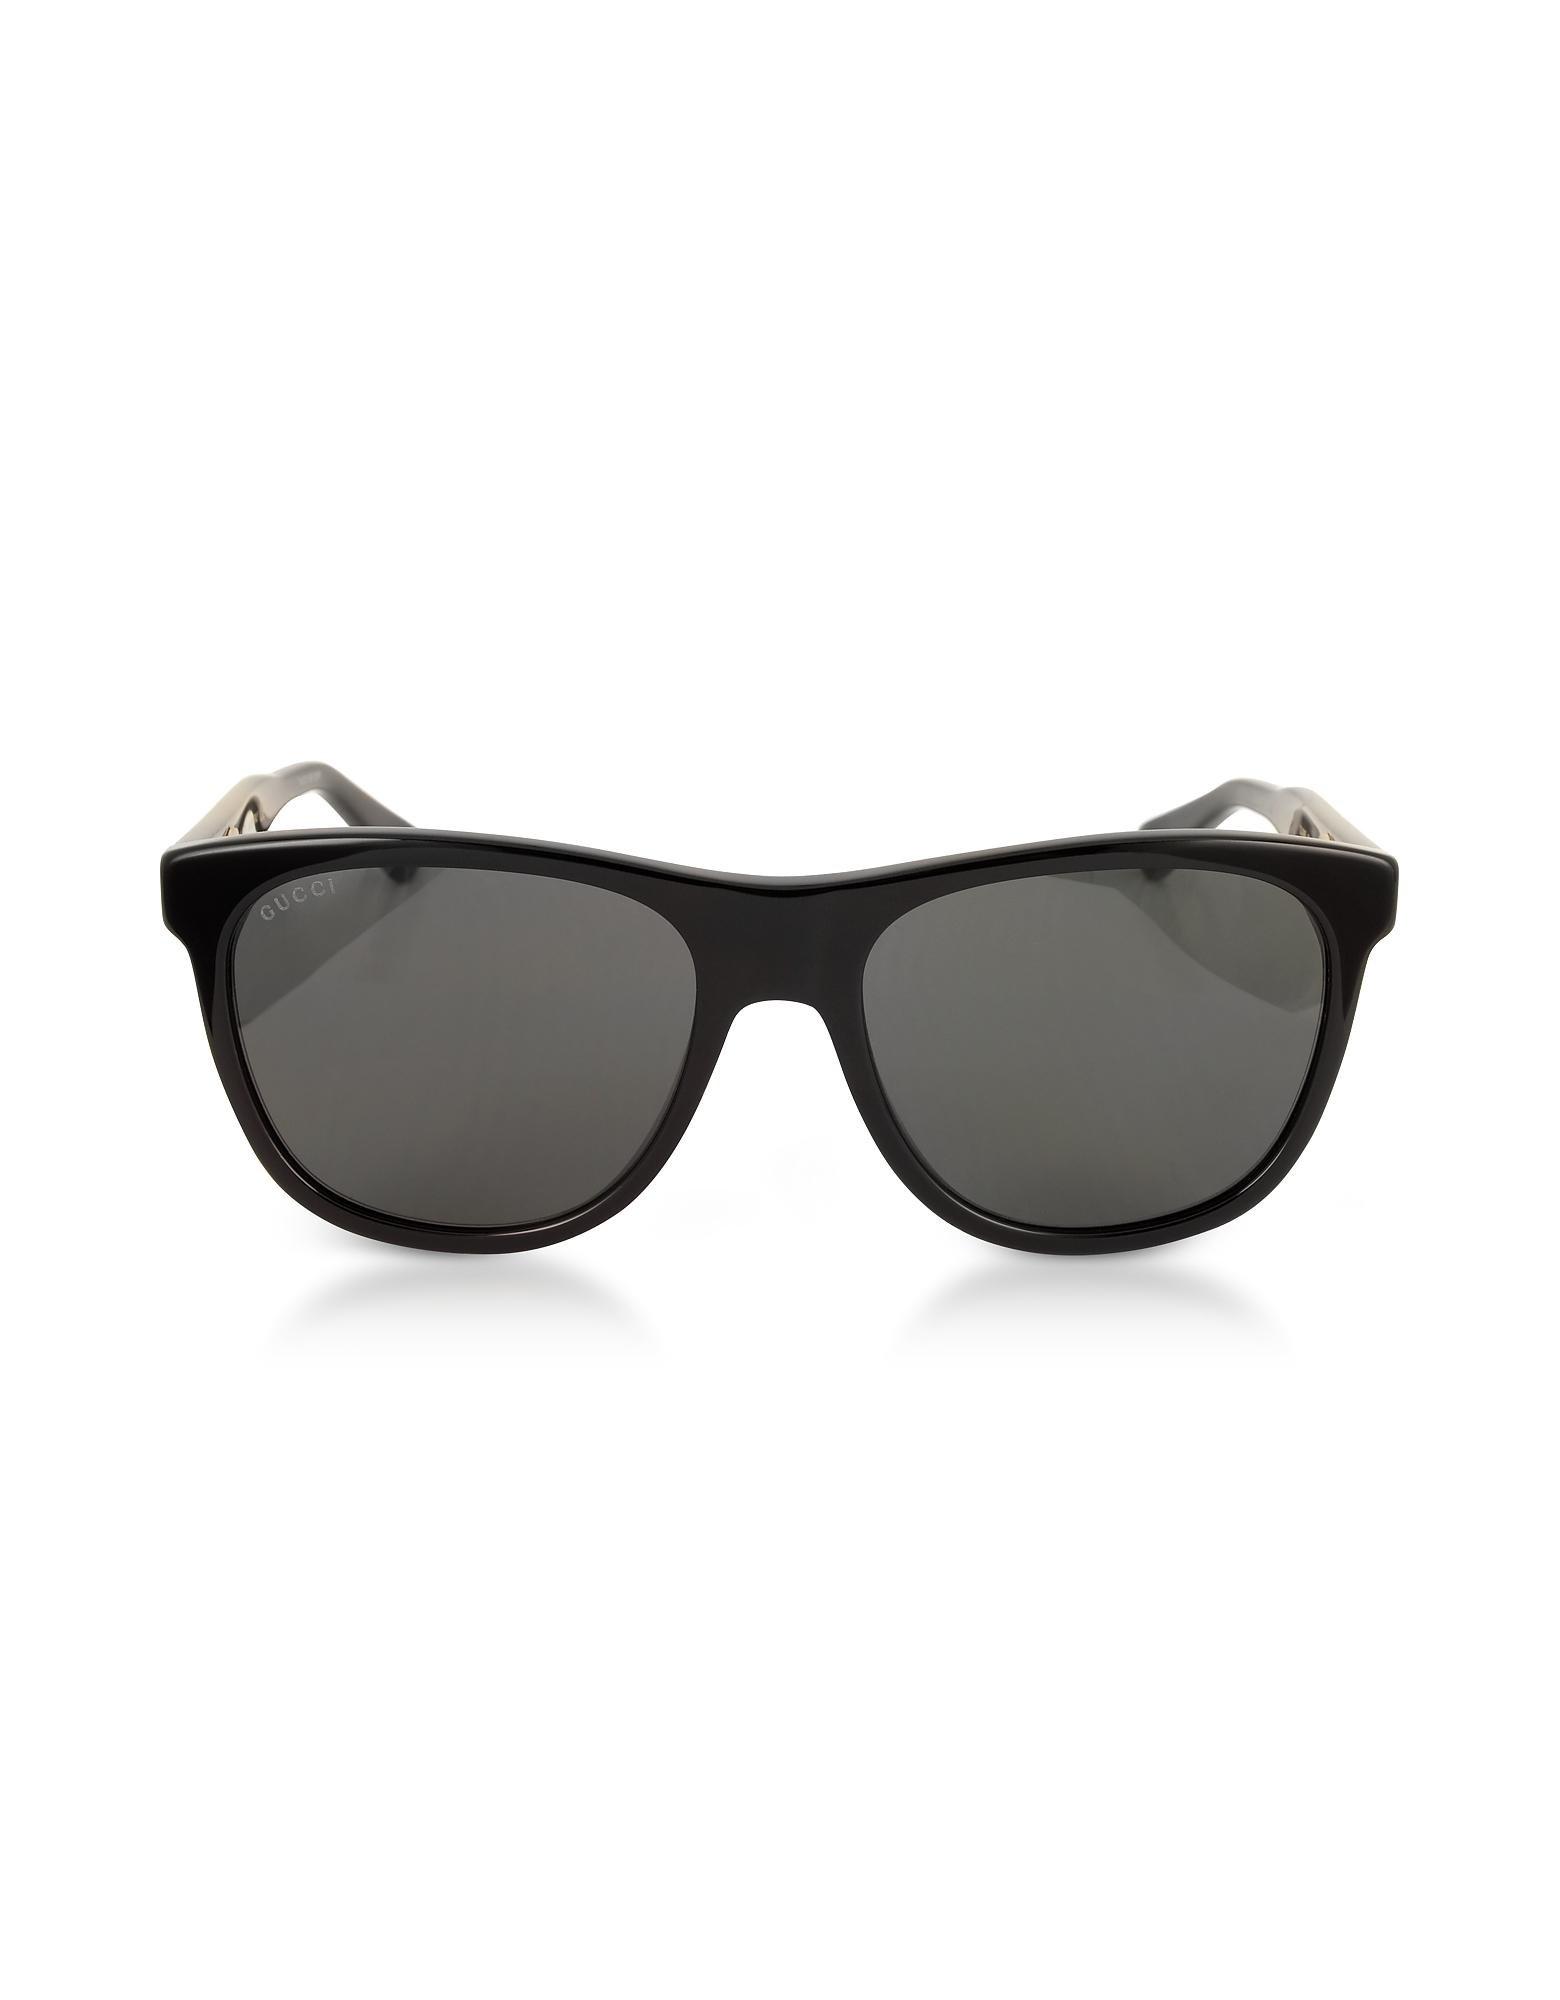 e0e9c4ec6bc Gucci - GG0266S Squared-frame Black Sunglasses W polarized Lenses for Men -  Lyst. View fullscreen